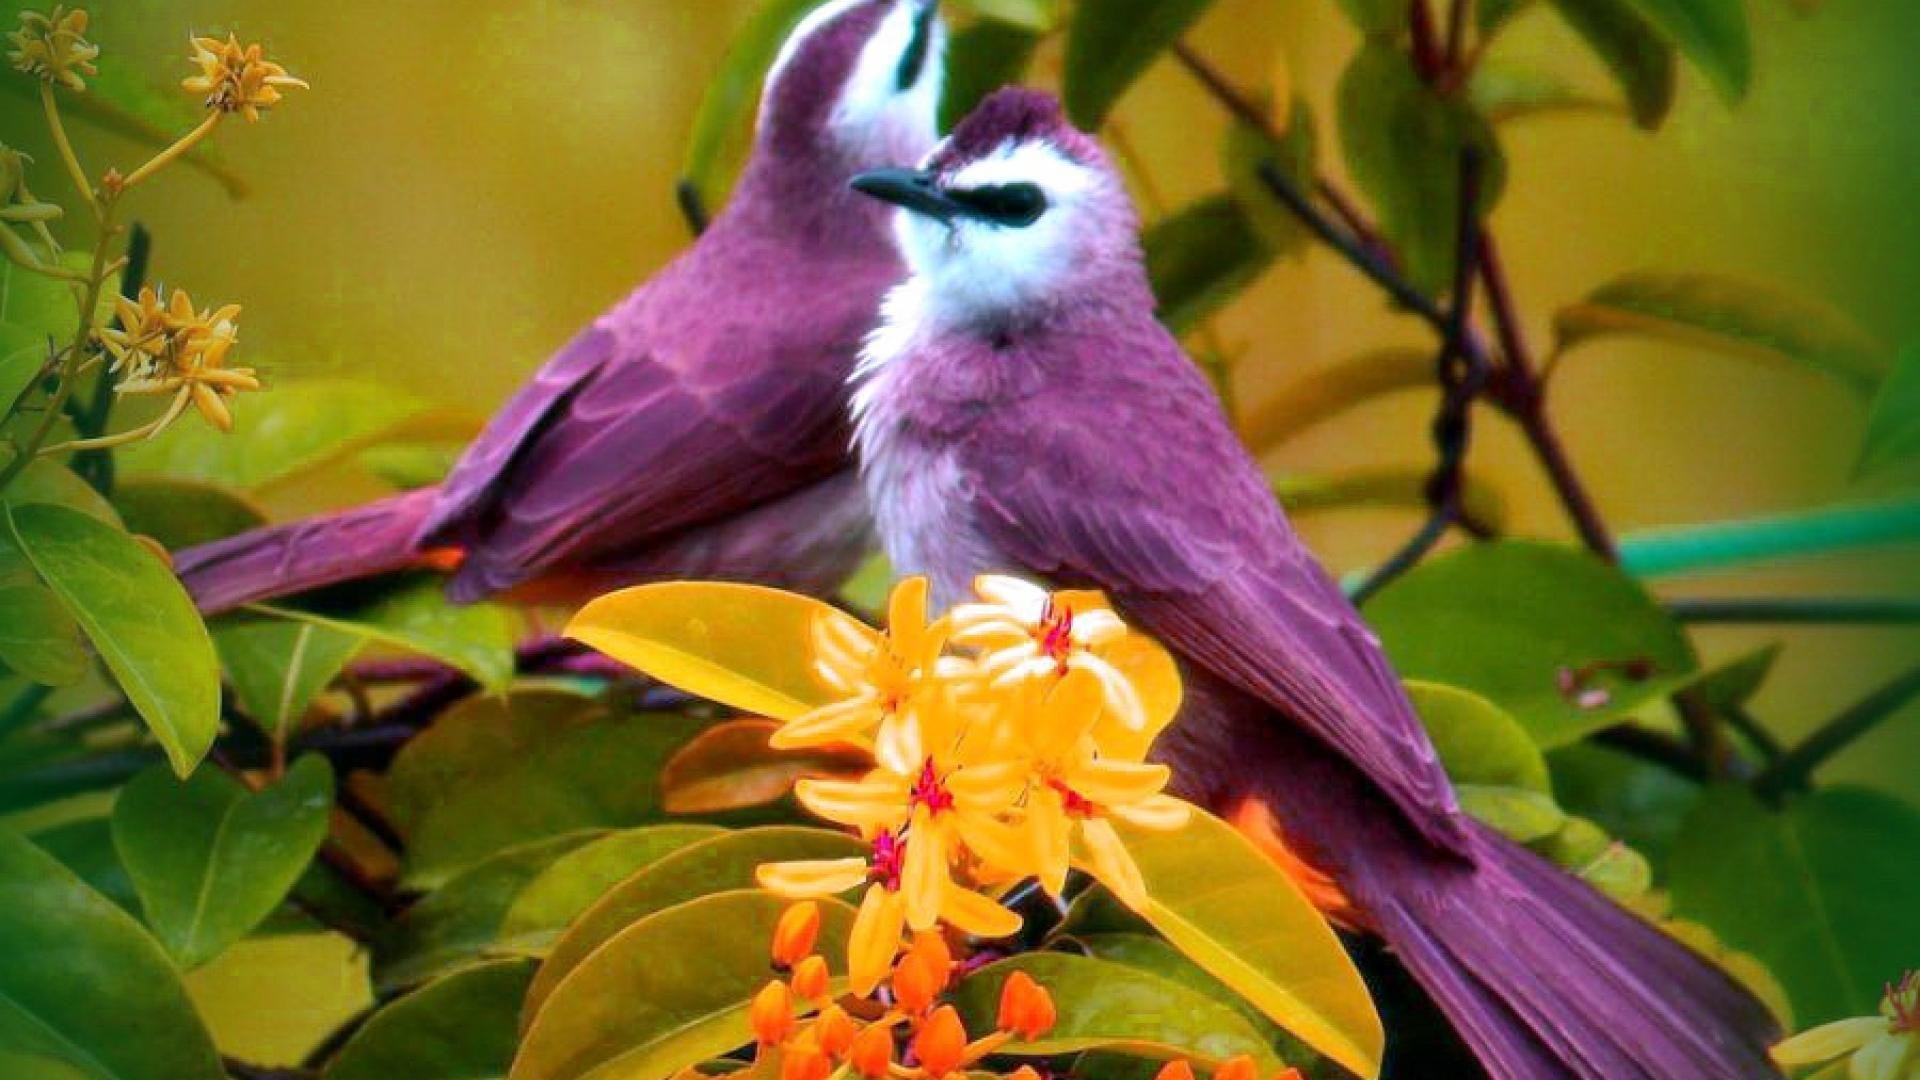 … download birds and flower wallpaper gallery …